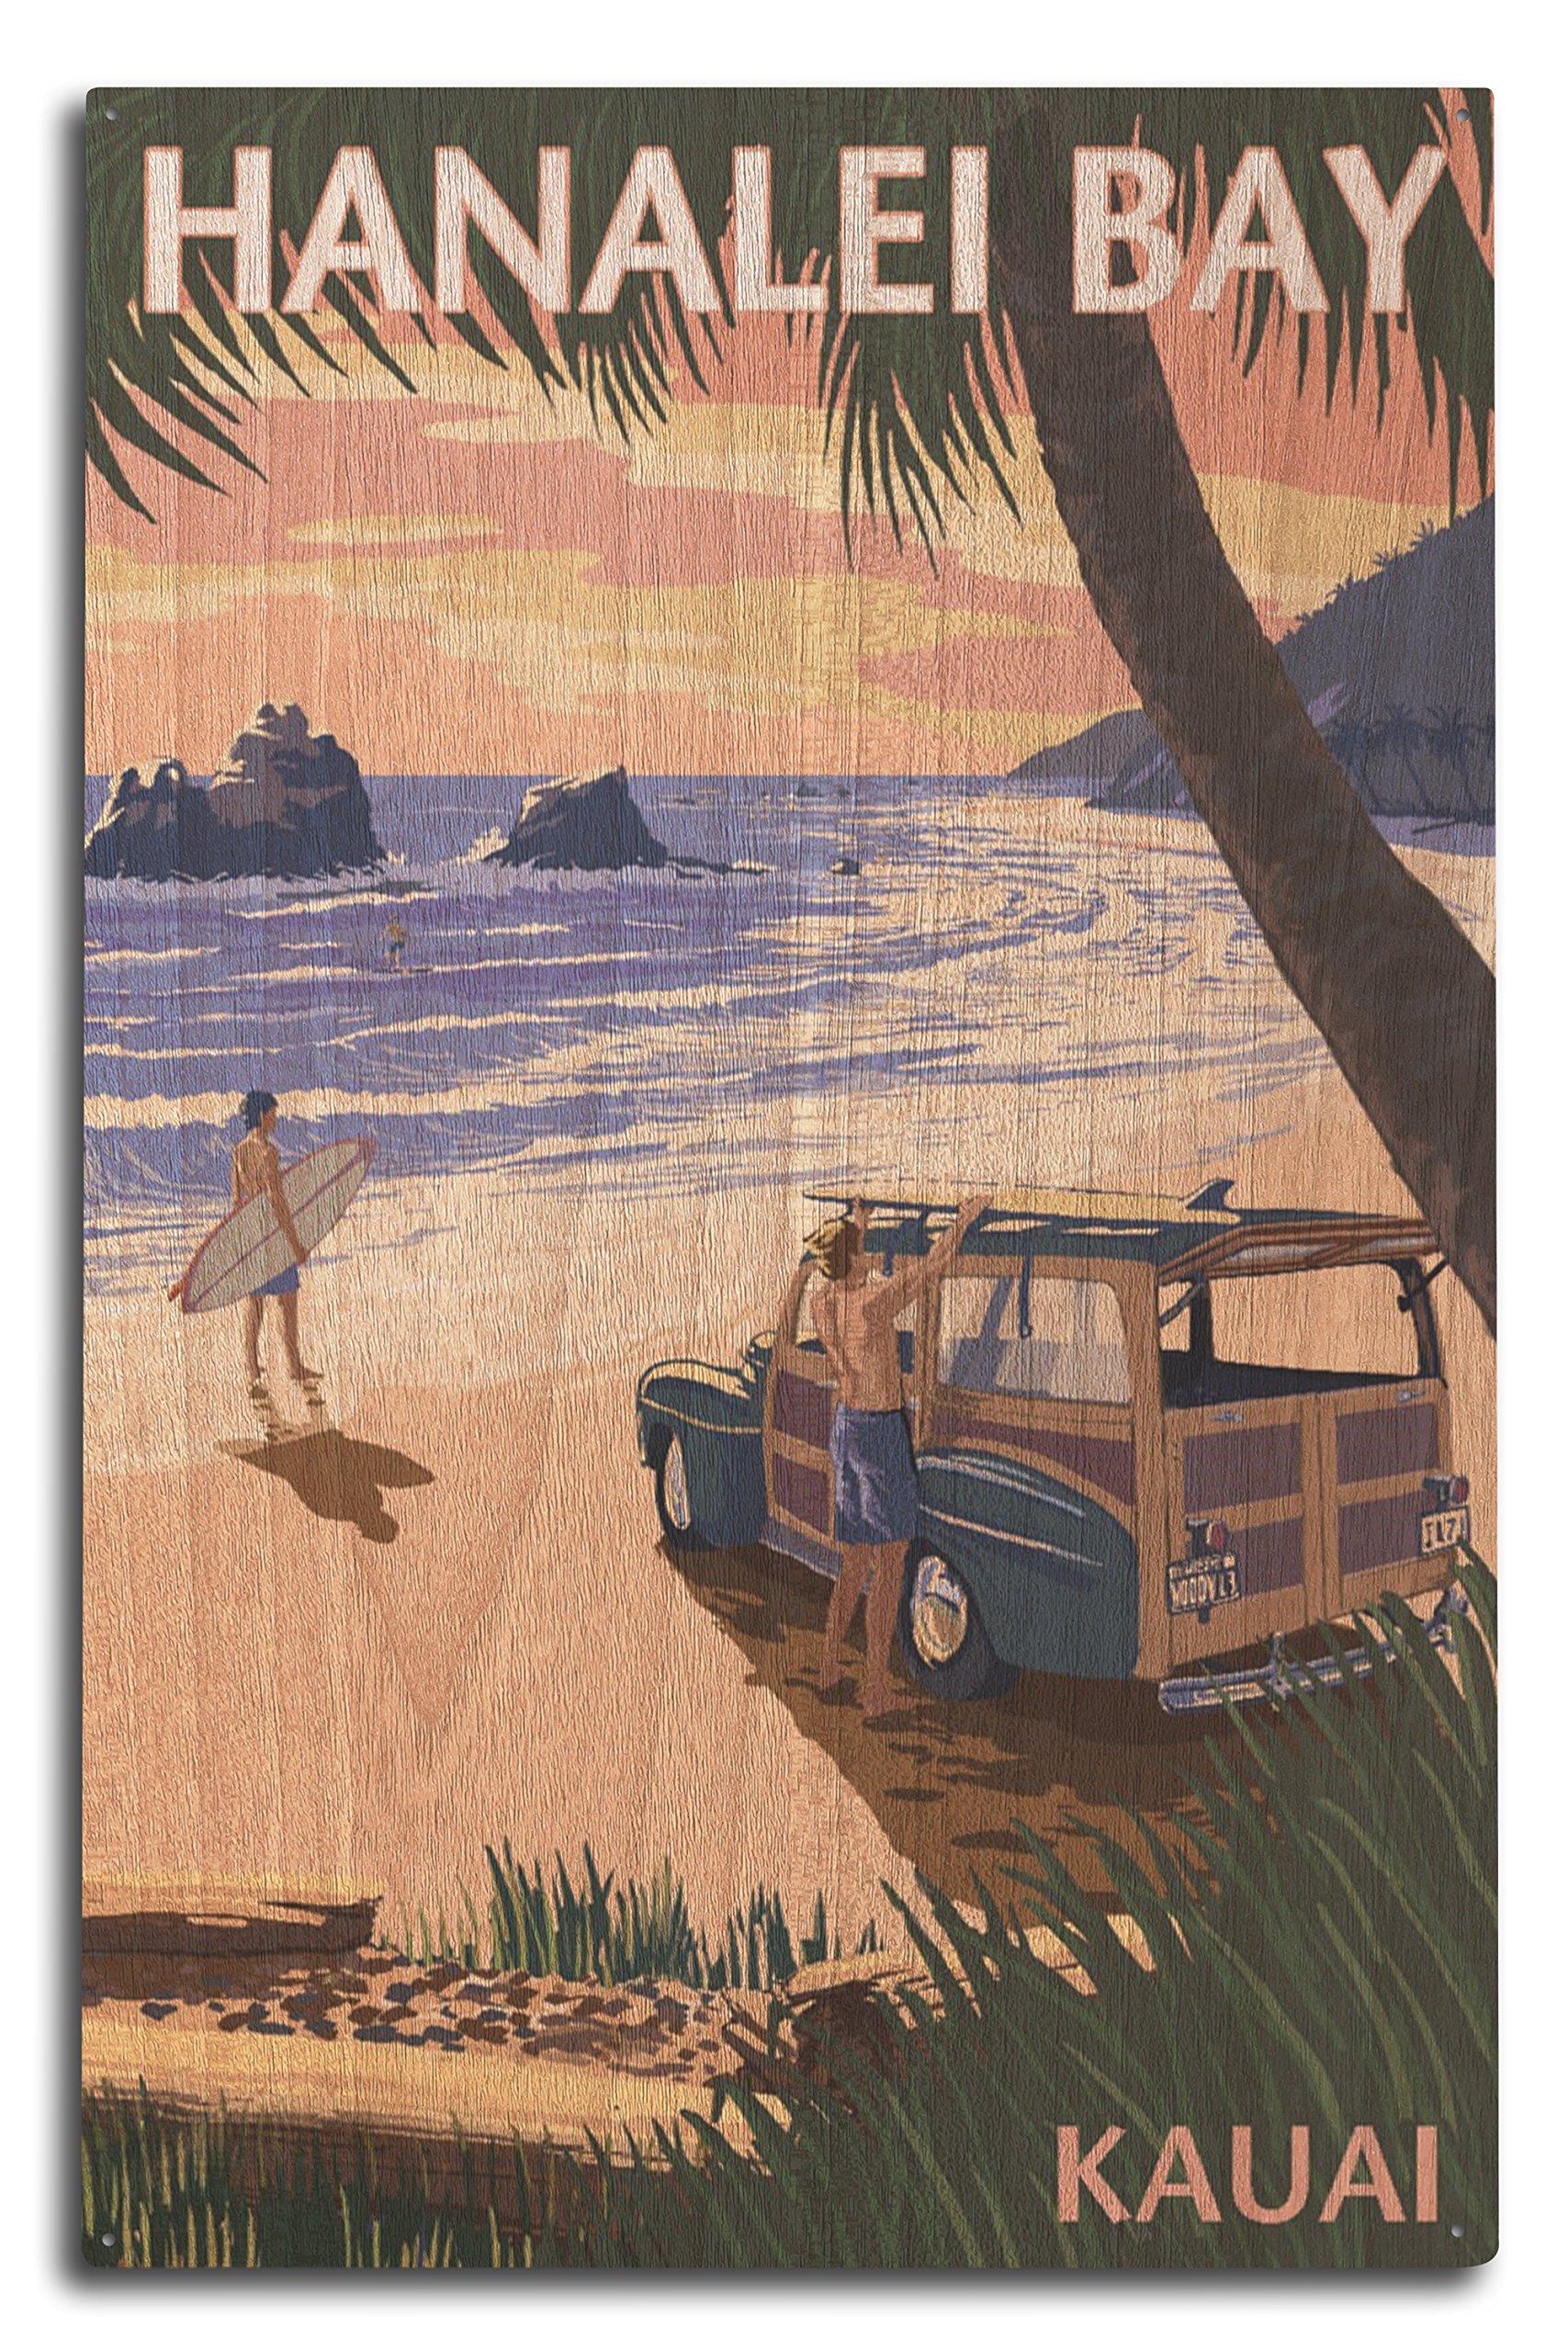 Lantern Press Hanalei Bay, Kauai, Hawaii - Woody on Beach (10x15 Wood Wall Sign, Wall Decor Ready to Hang)